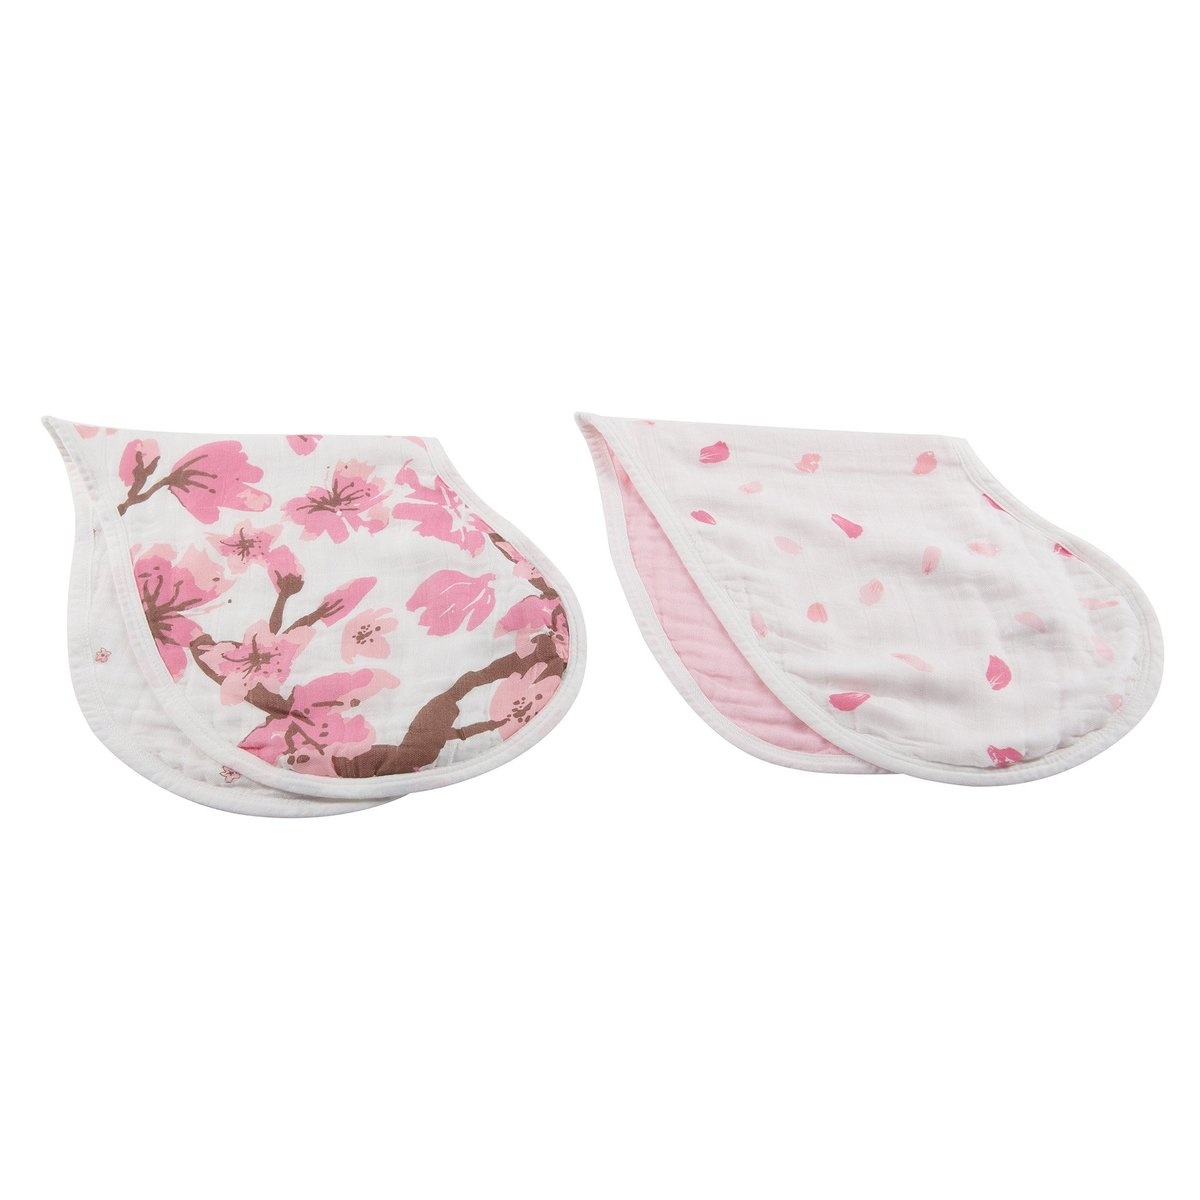 Newcastle Classics Heart 2-in-1 Muslin Burp Cloth Bibs (2-pack)